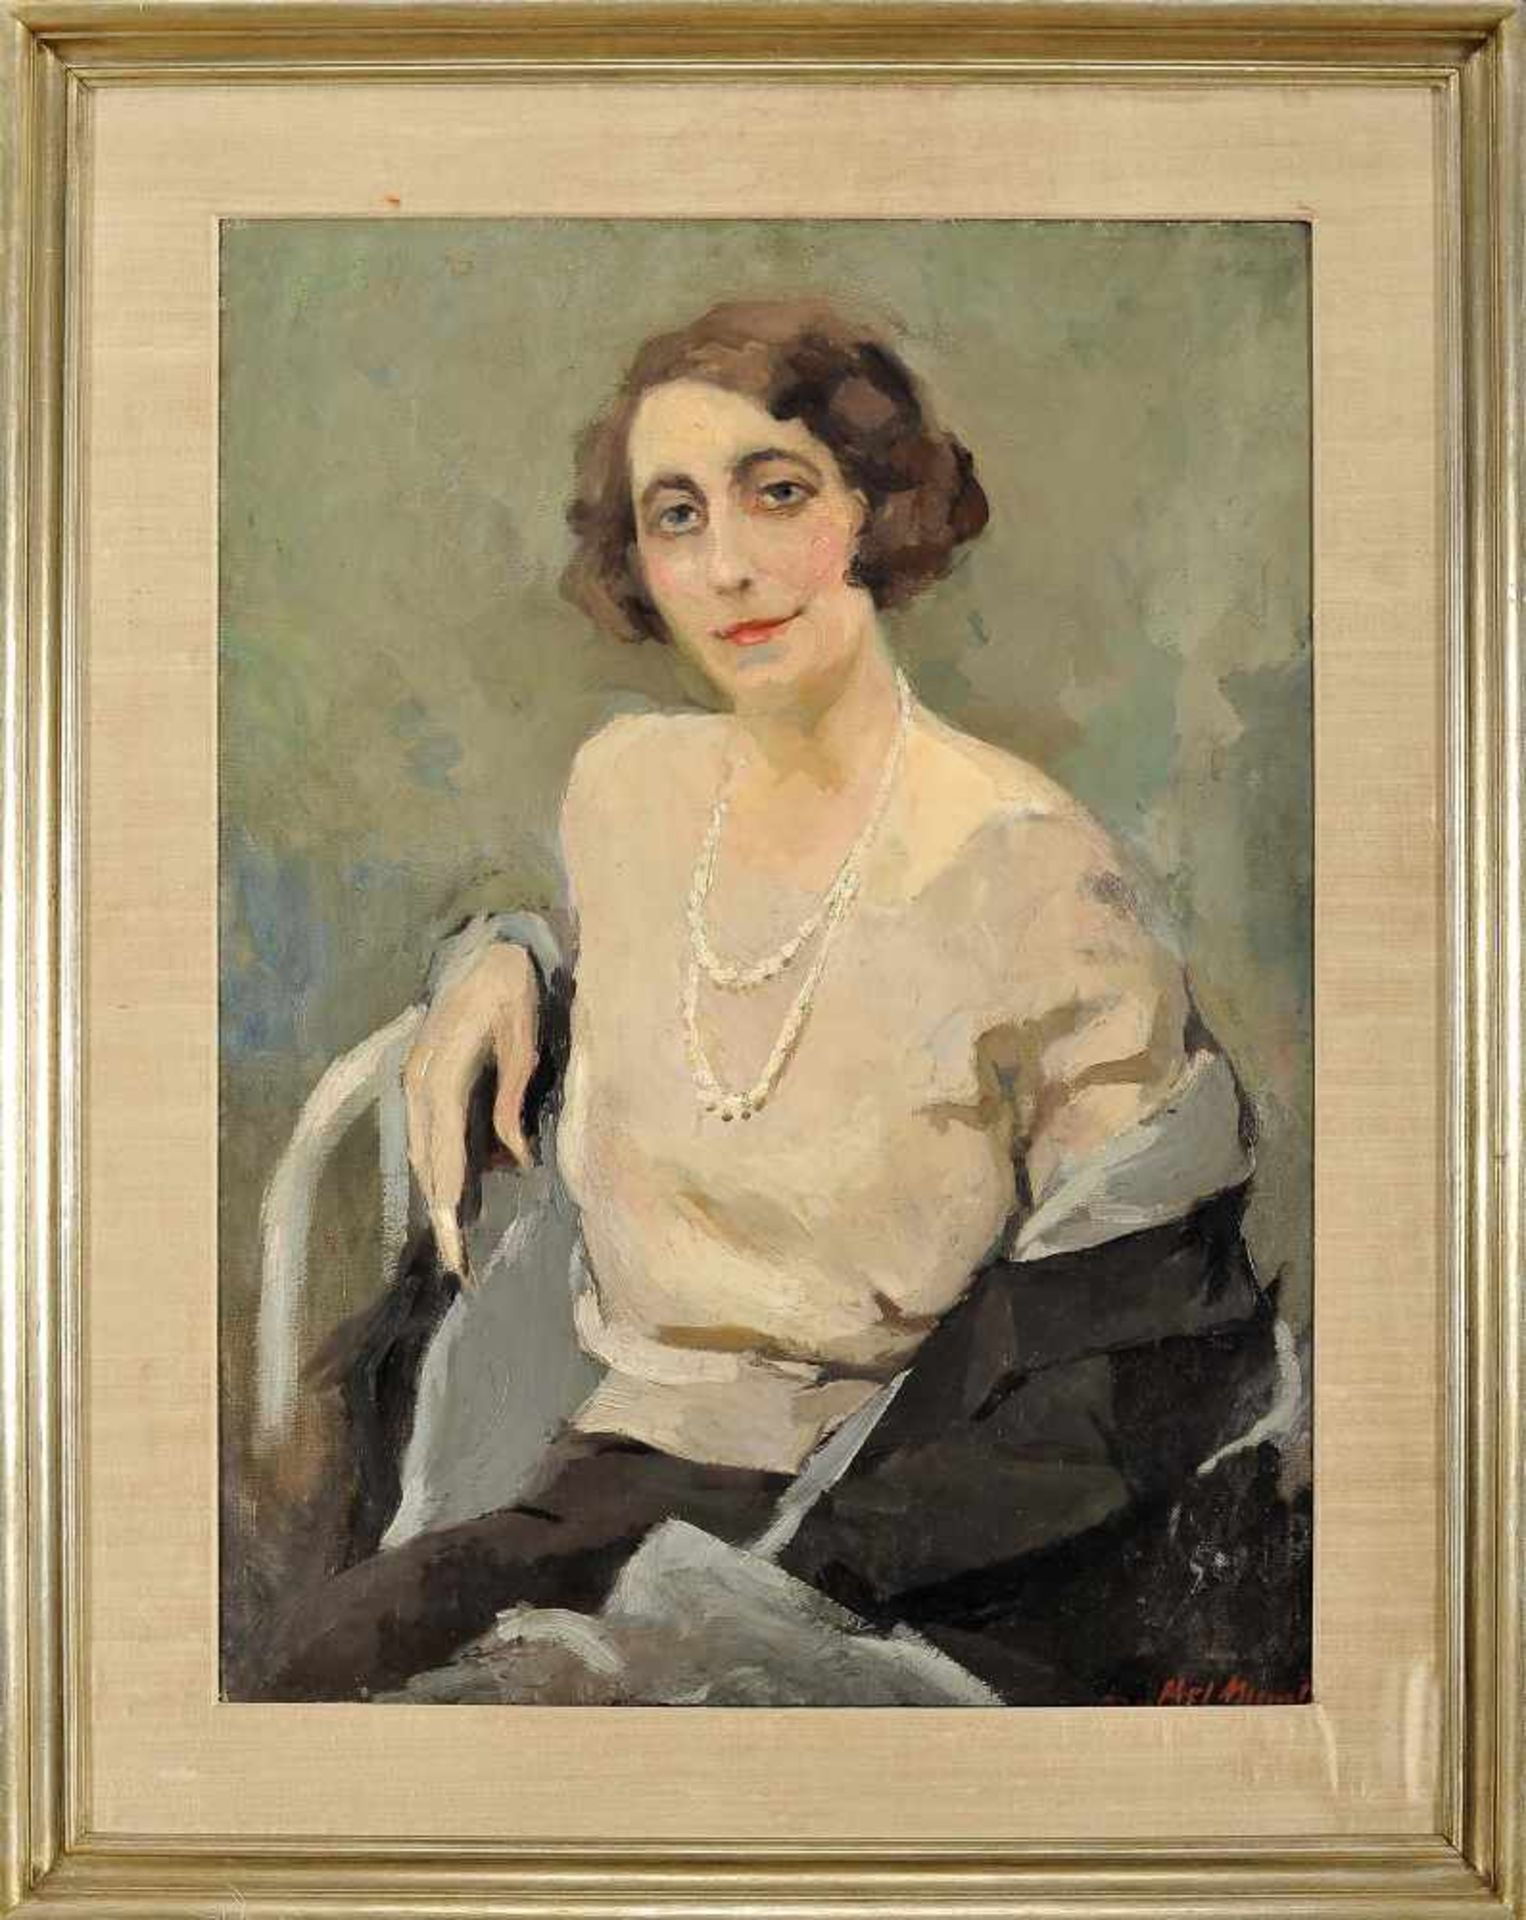 Portrait of painter Maria Adelaide de Lima Cruz